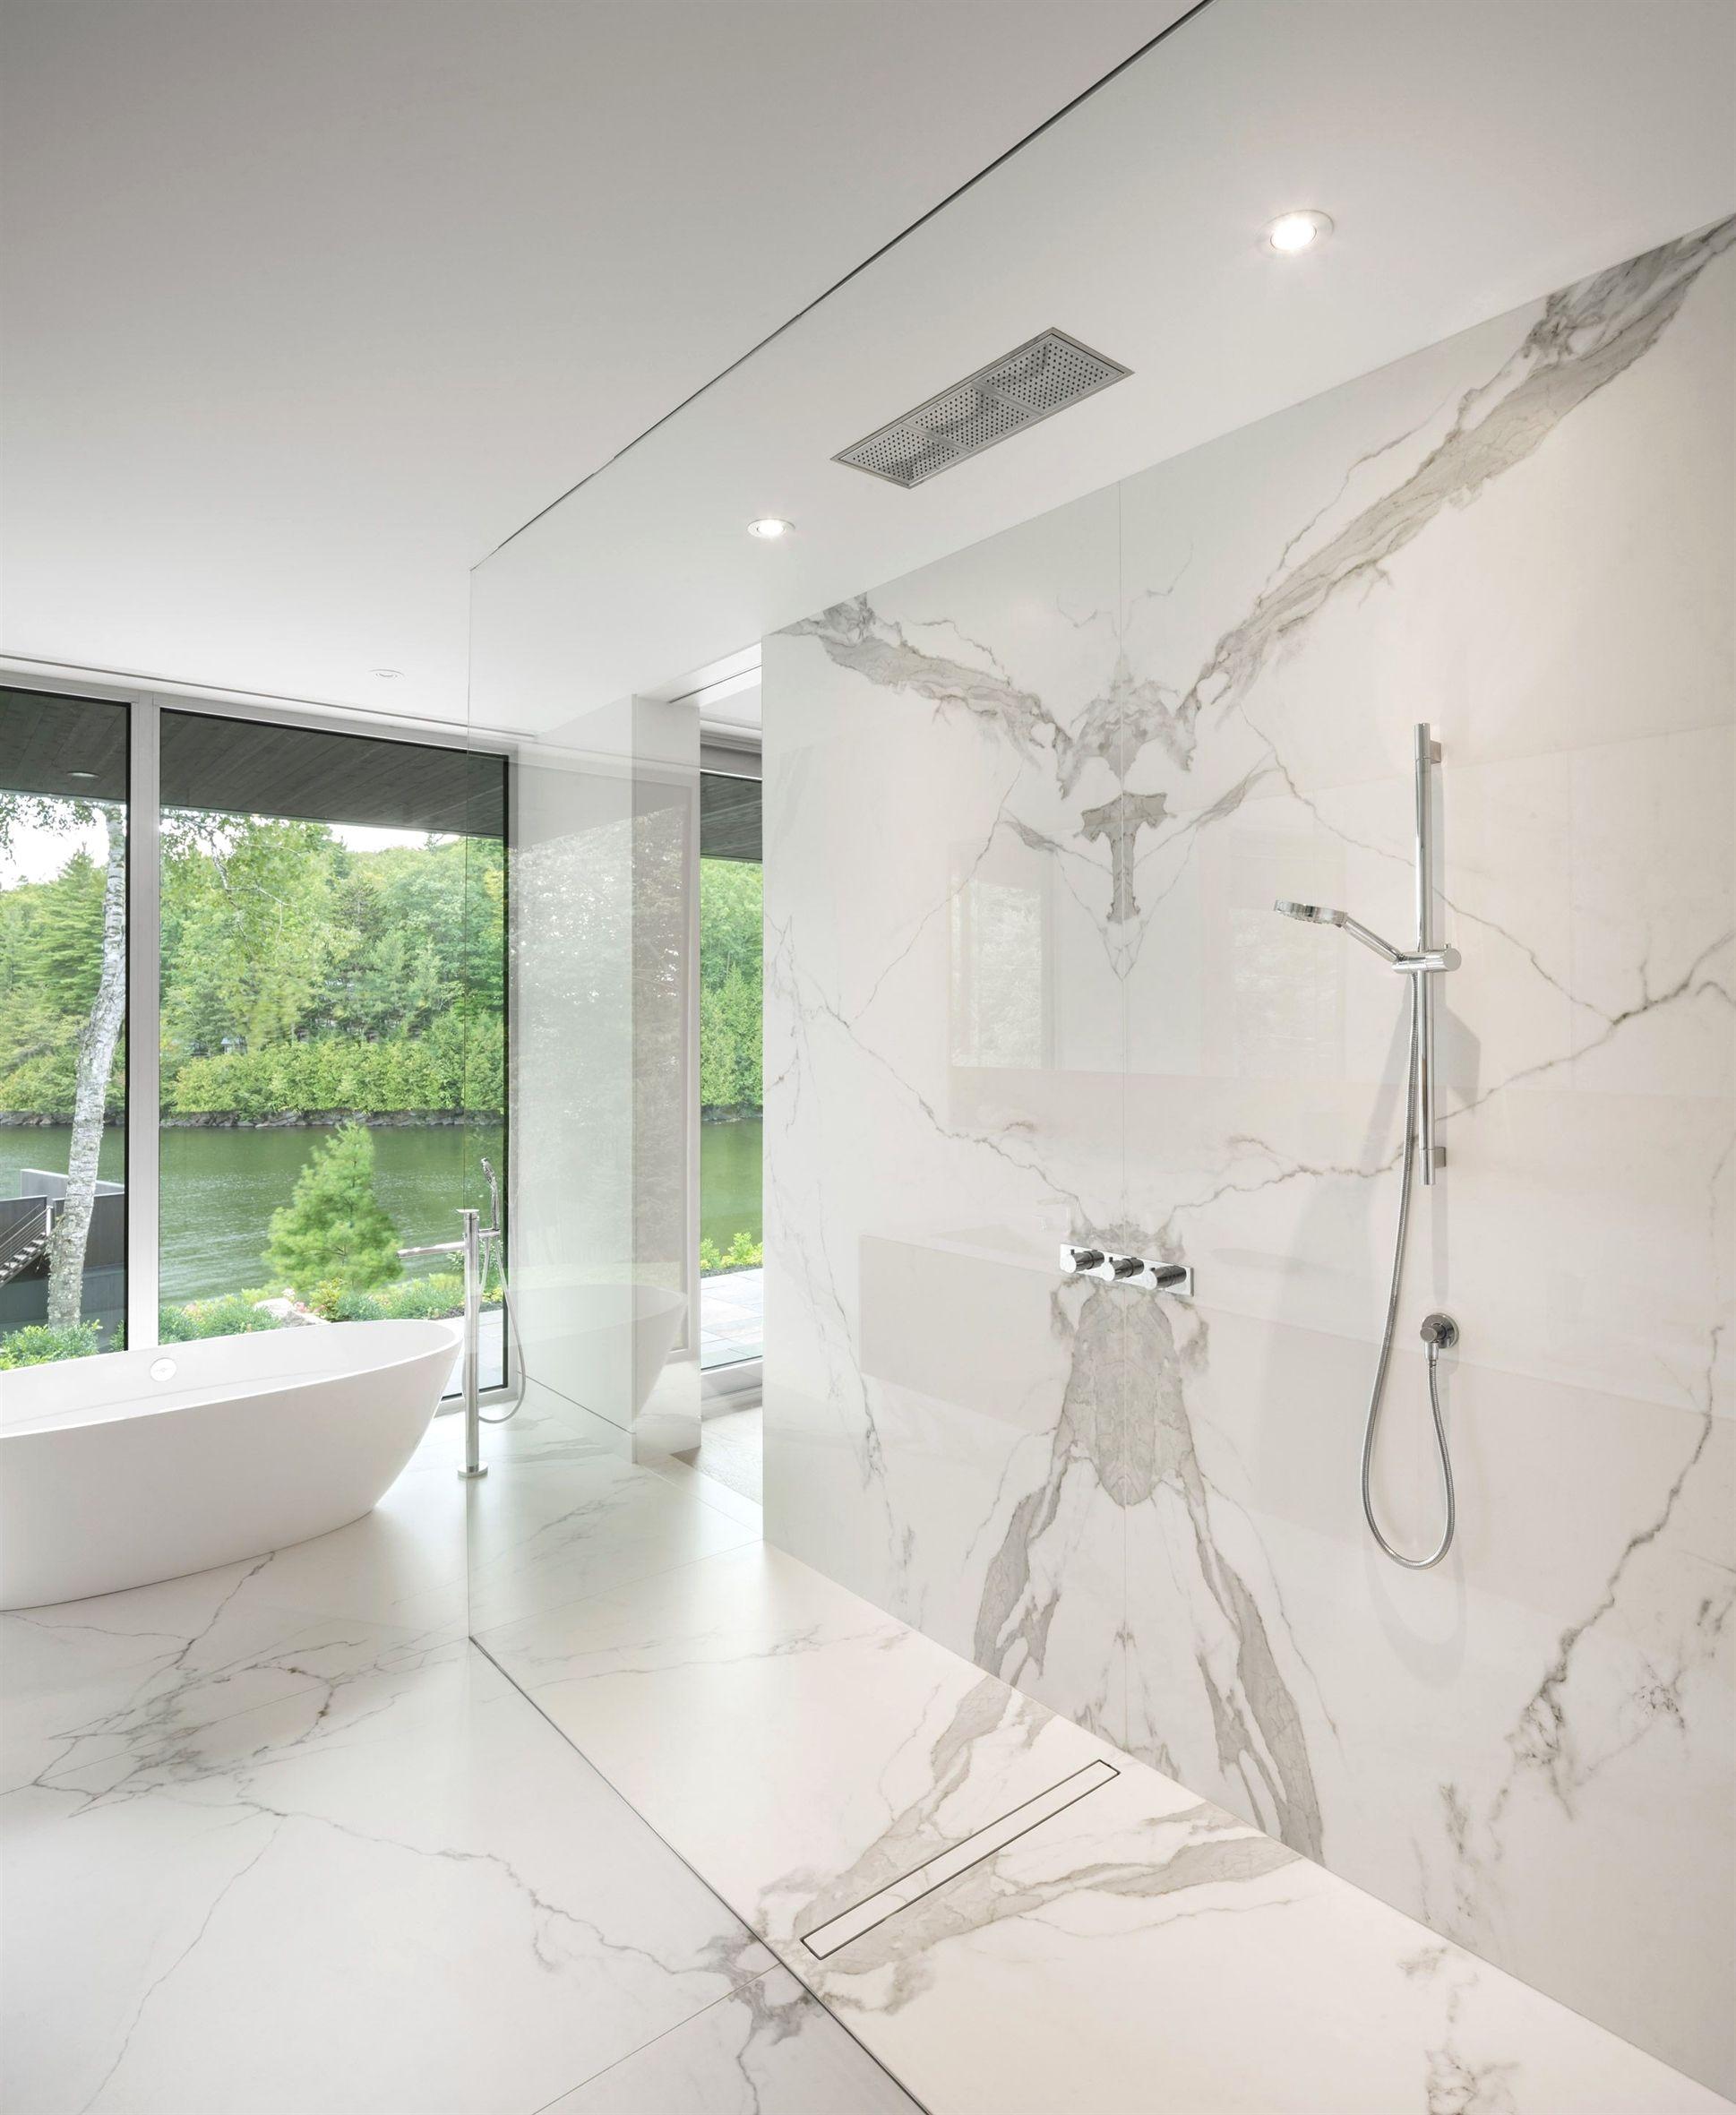 Photography stephane groleau sweet home make interior decoration design ideas decor also rh pinterest